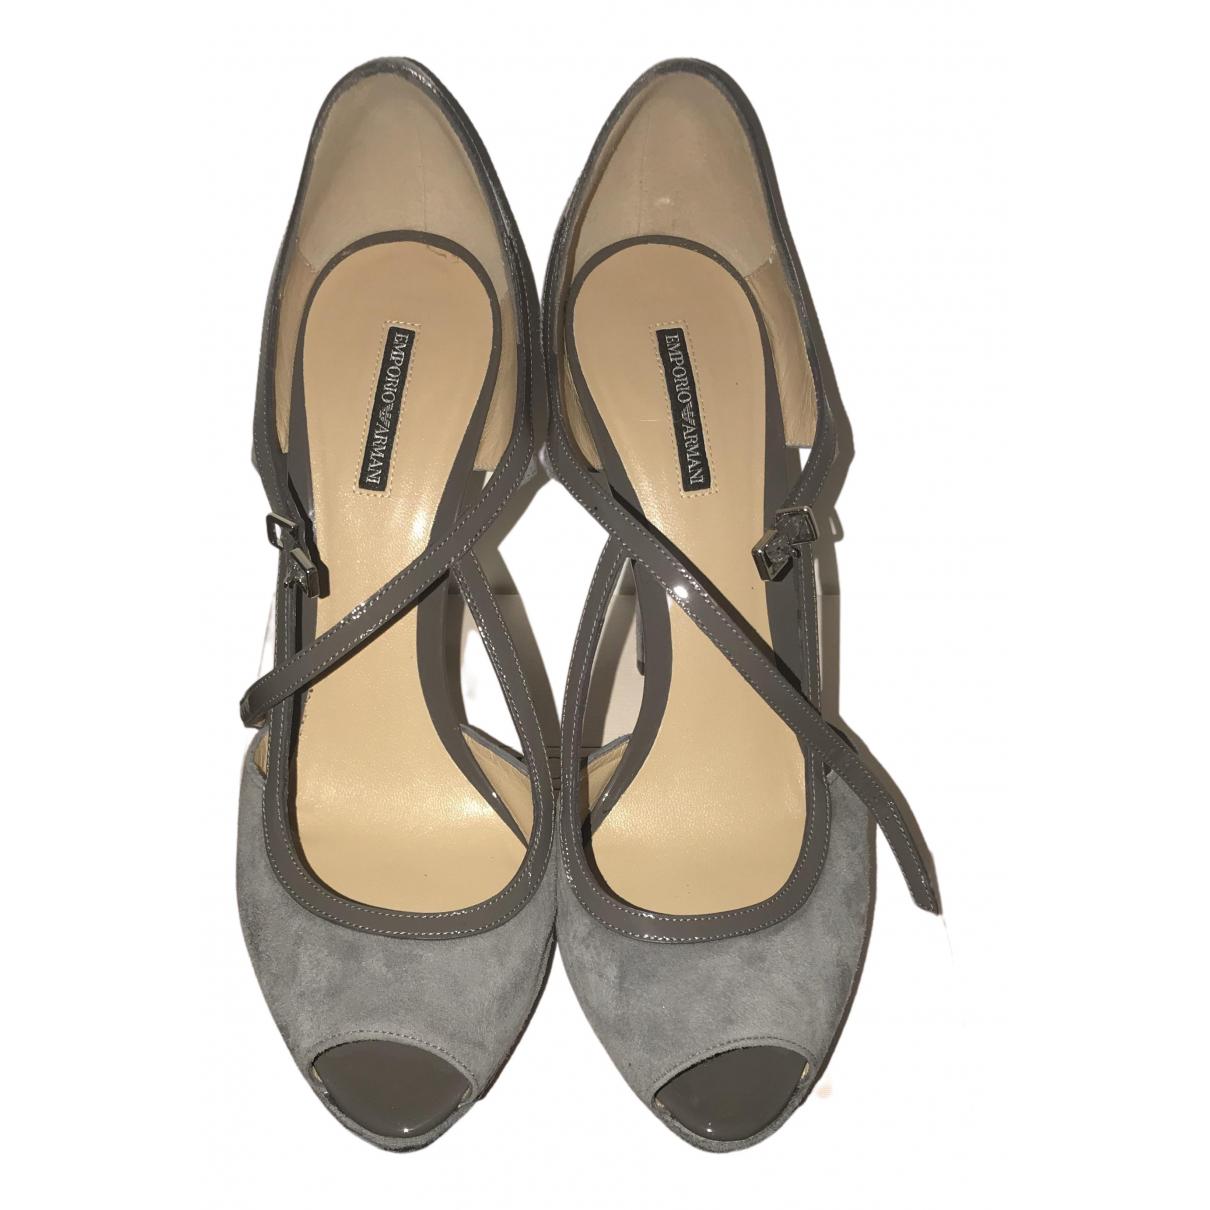 Emporio Armani - Escarpins   pour femme en suede - gris